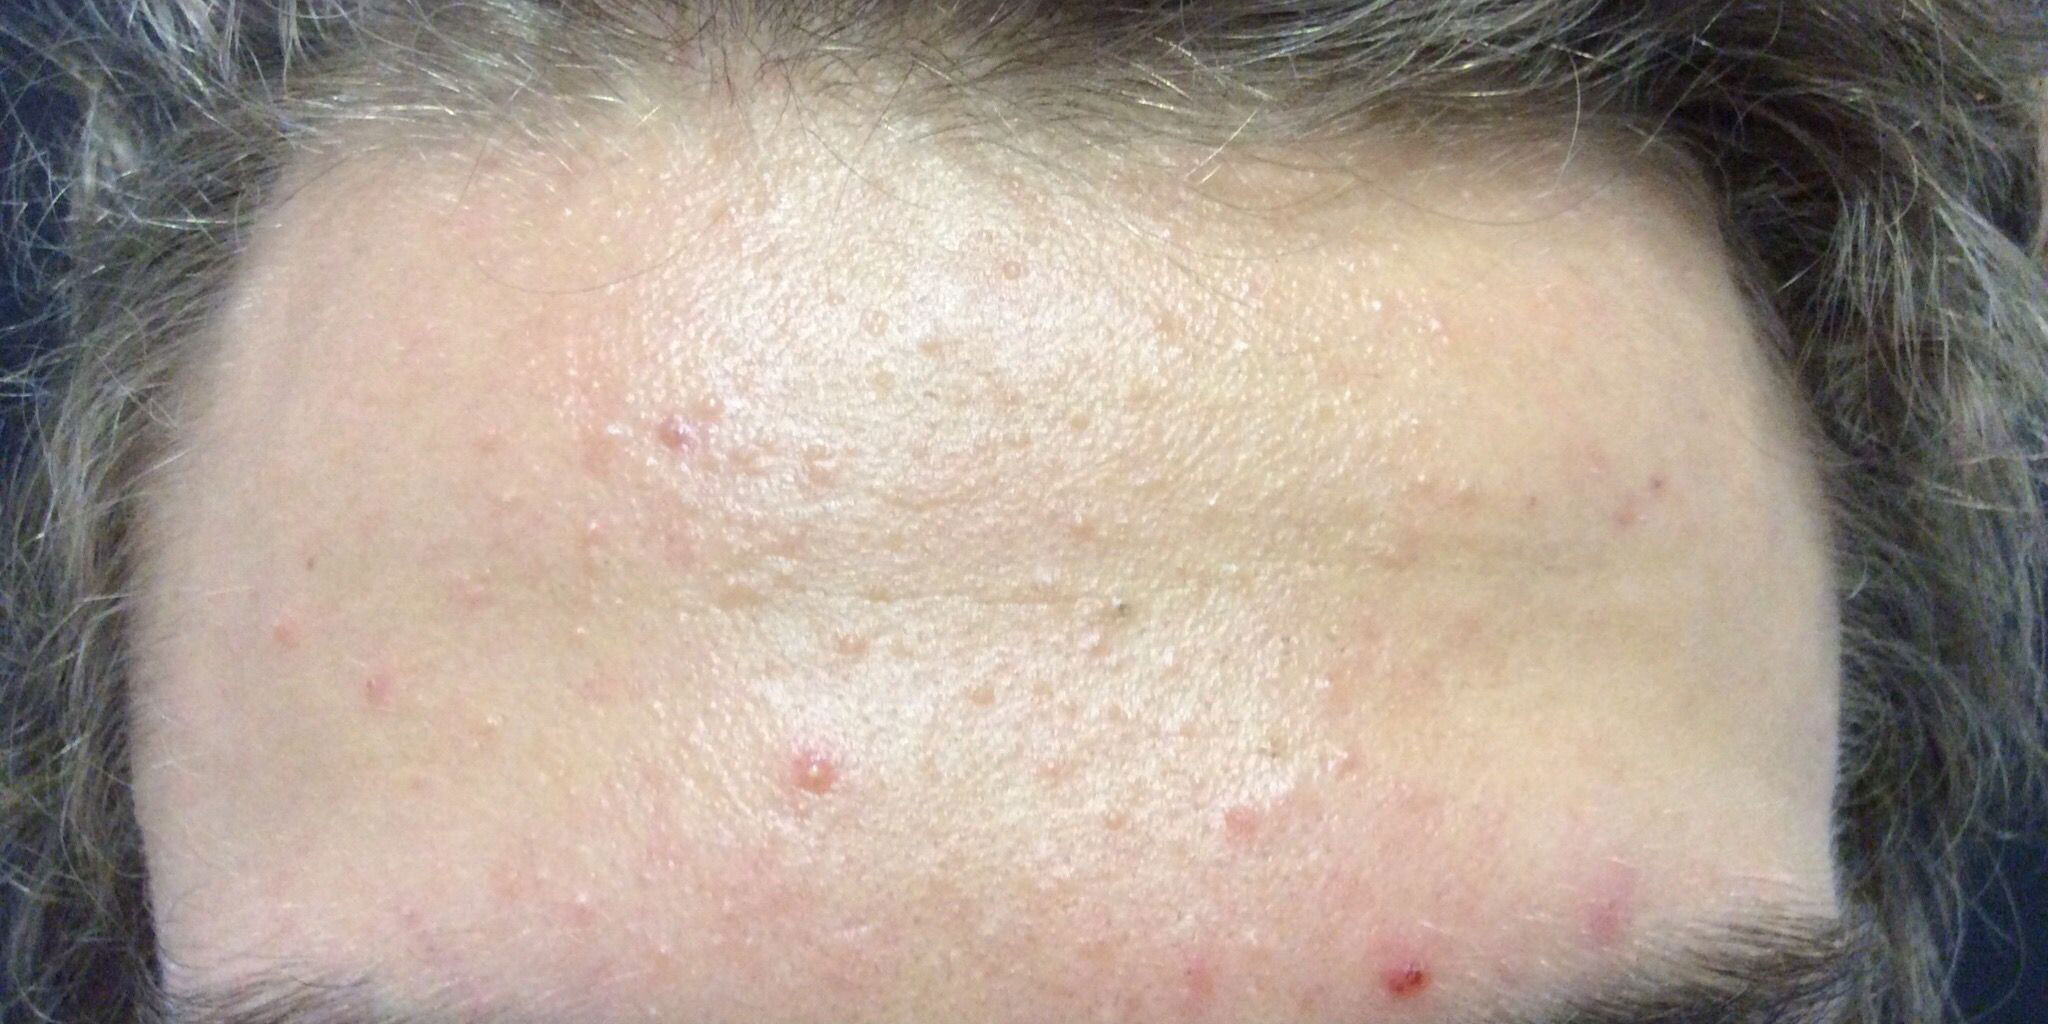 akne zdravljenje aken